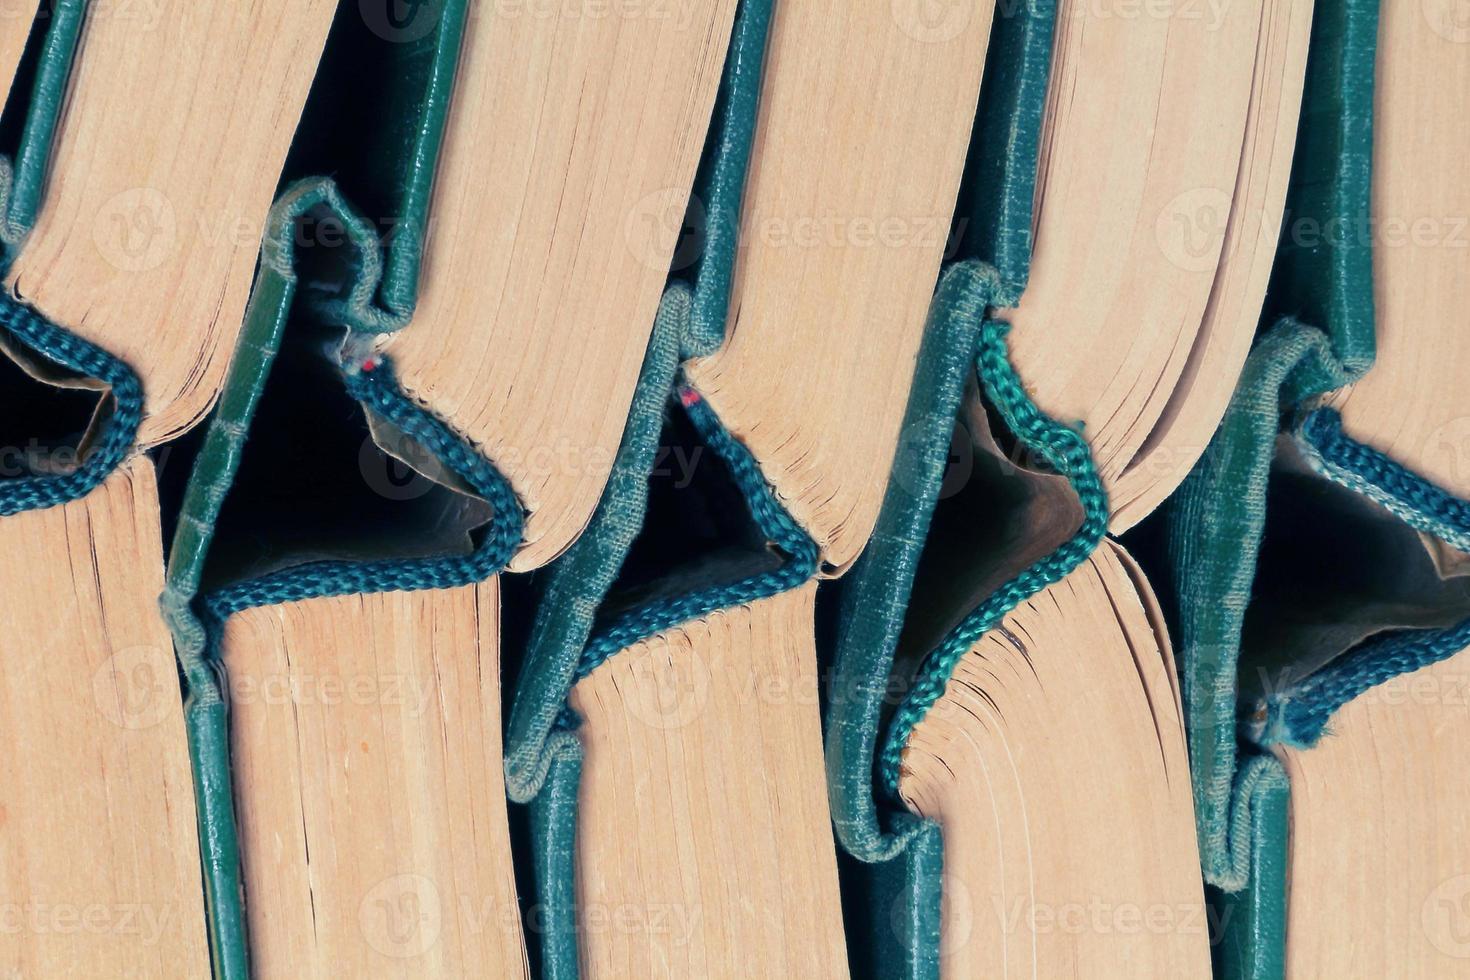 apilar viejos libros de tapa dura foto